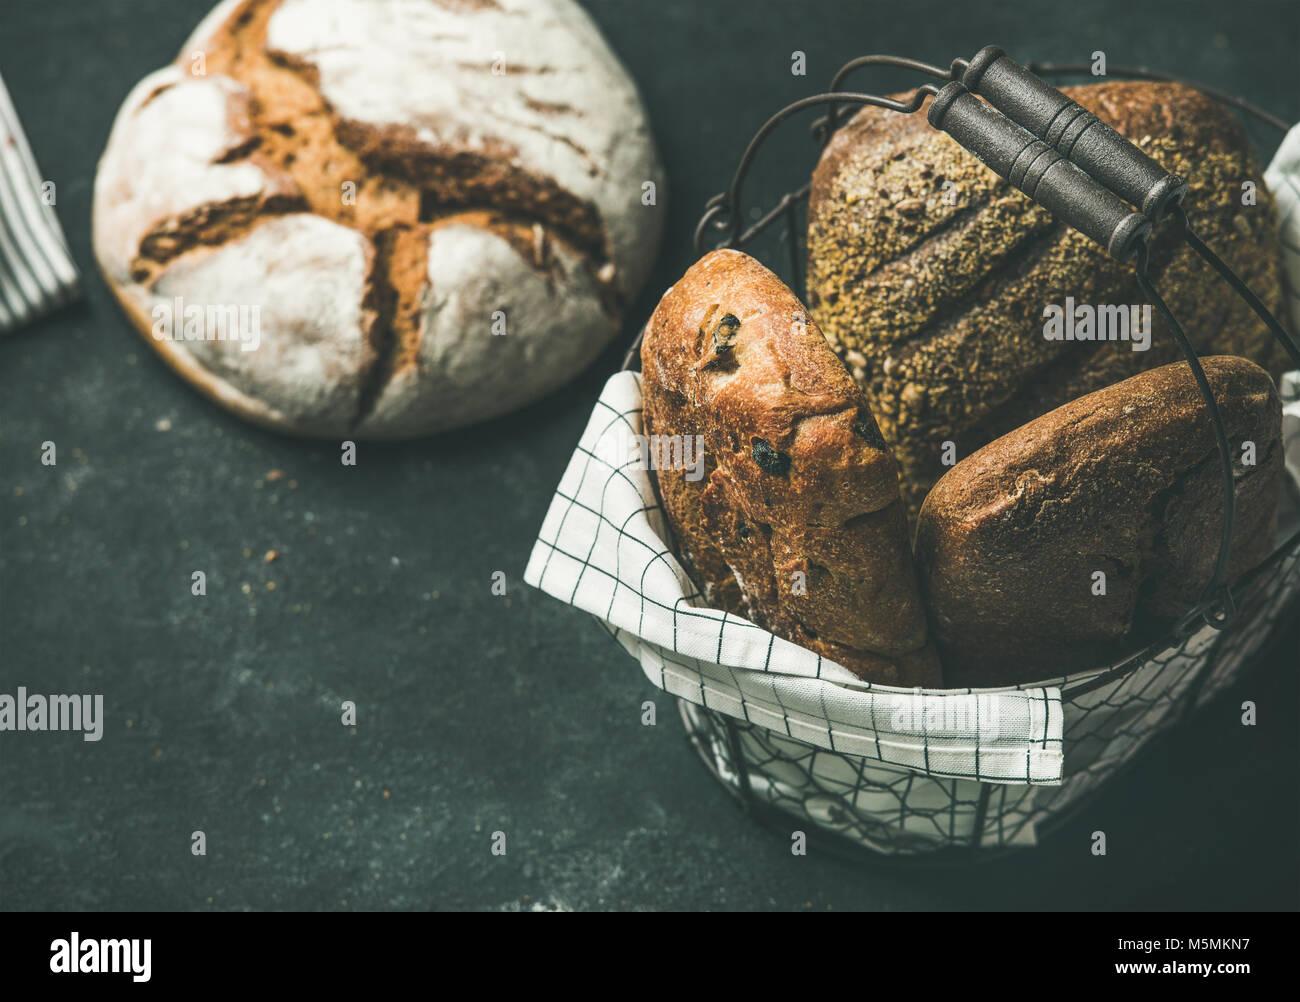 Varias hogazas de pan sobre fondo negro, espacio de copia Imagen De Stock